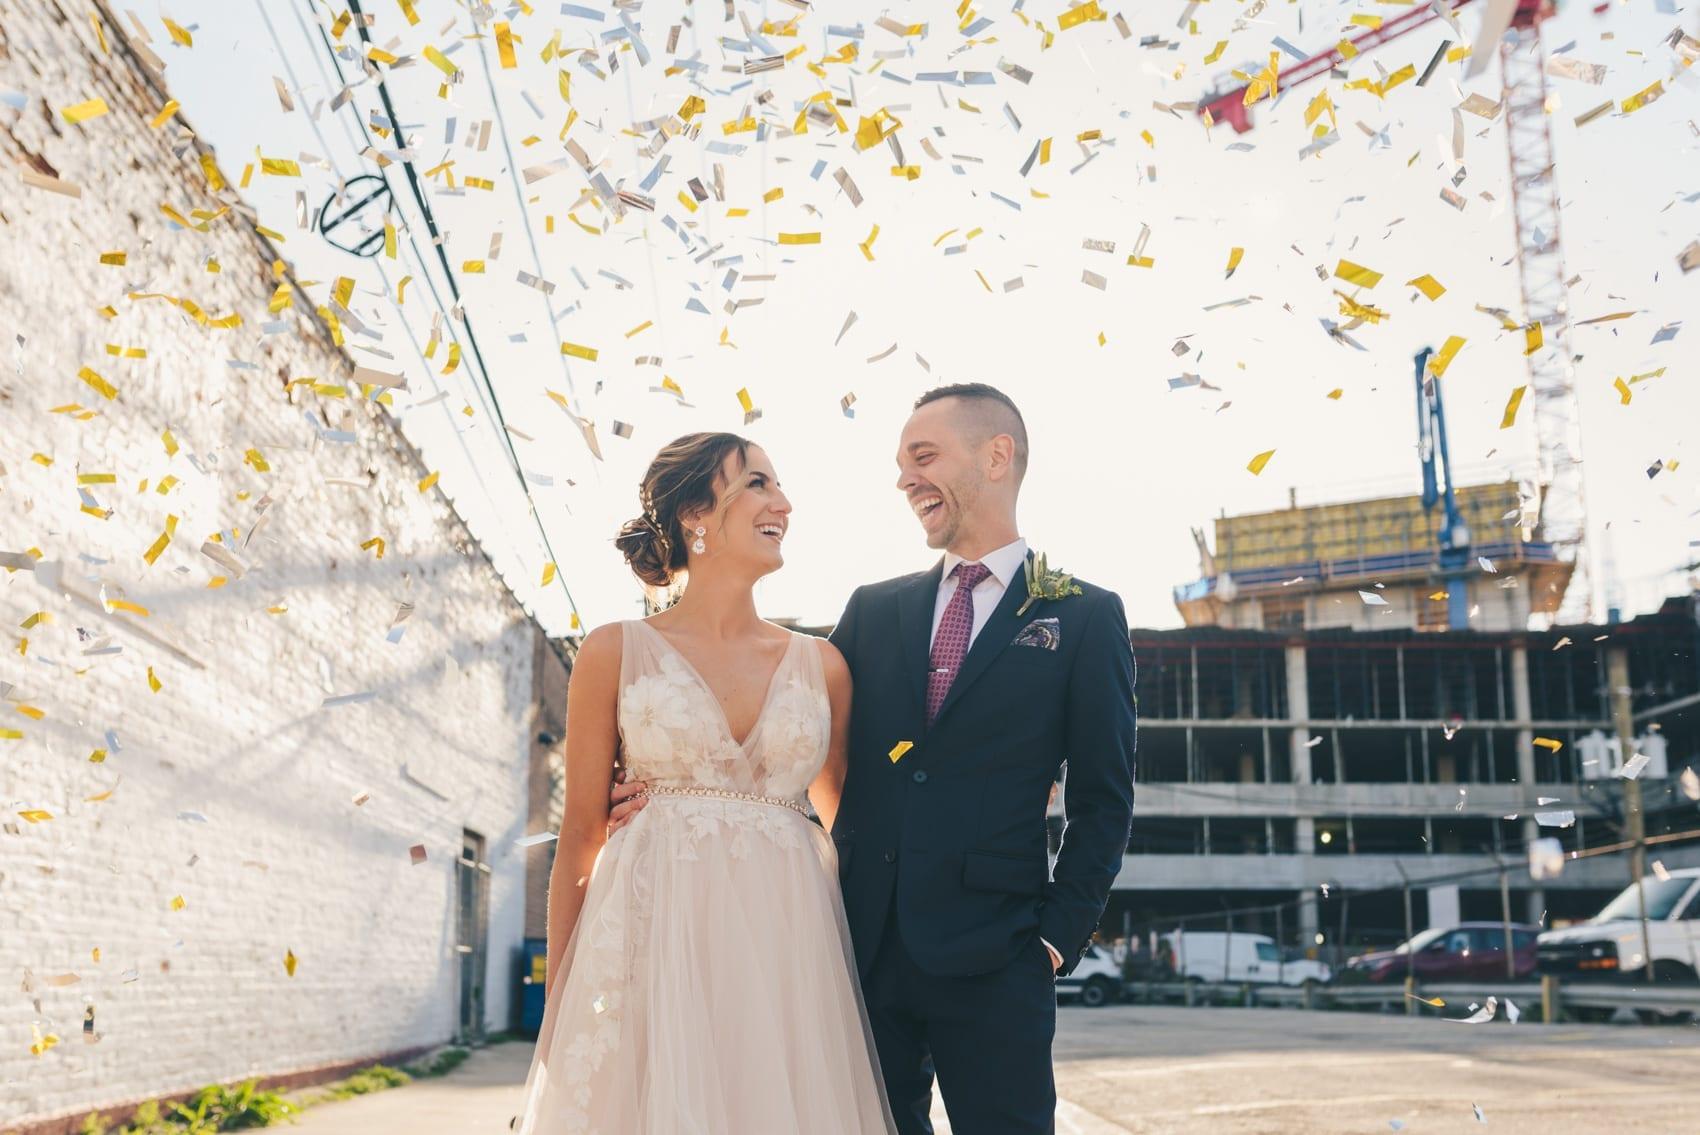 Thara Photo Chicago Summer Wedding Photographer Brique West Loop Downtown